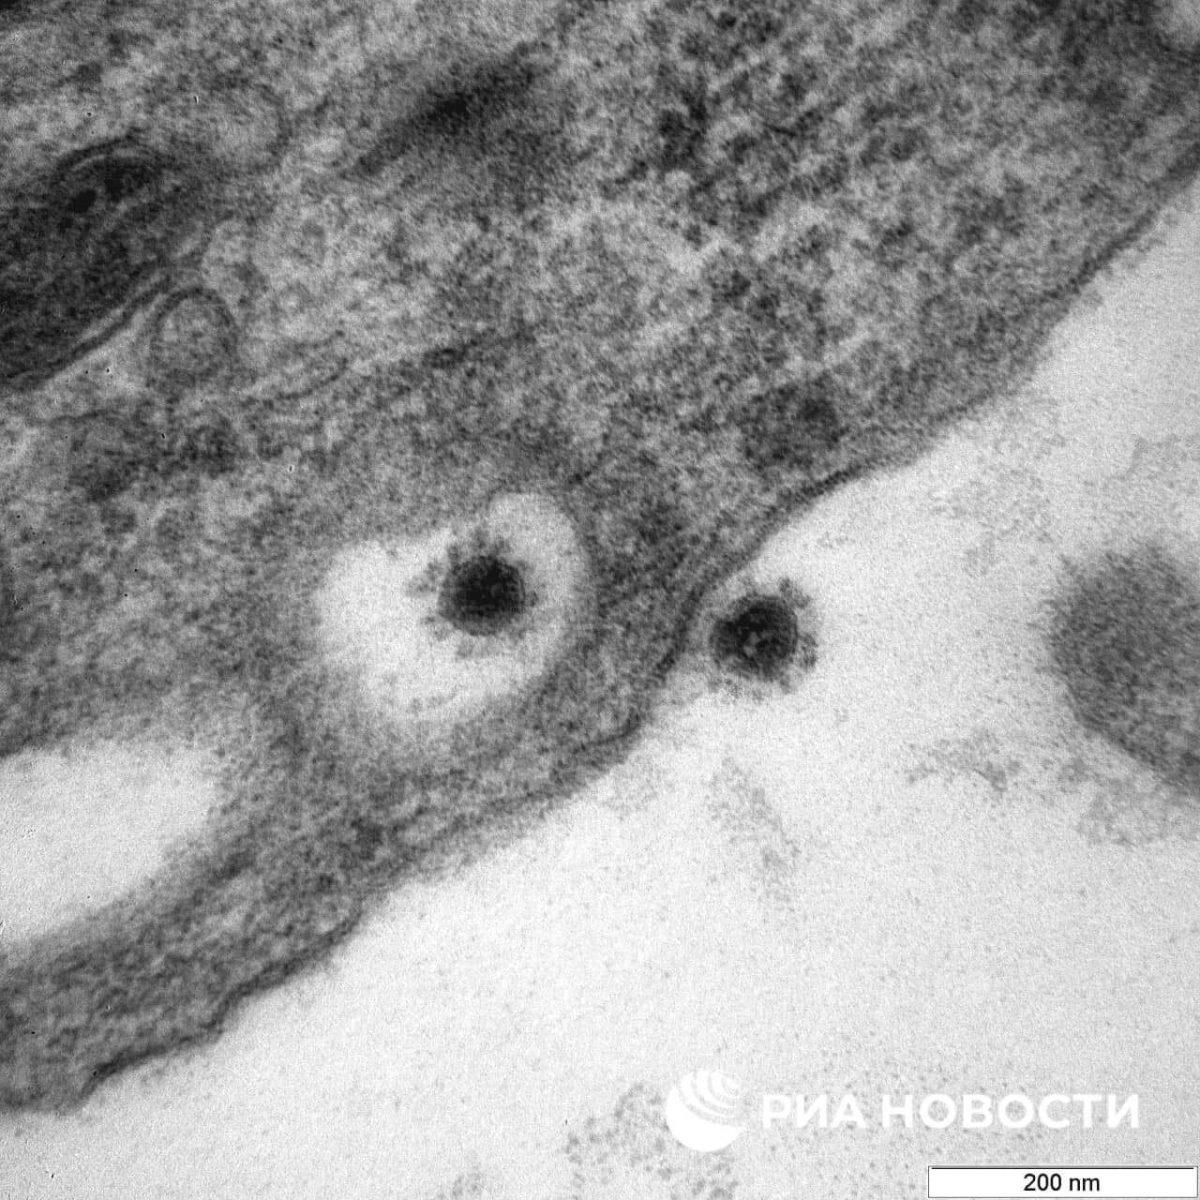 Дельта-штамм коронавируса показали на фото